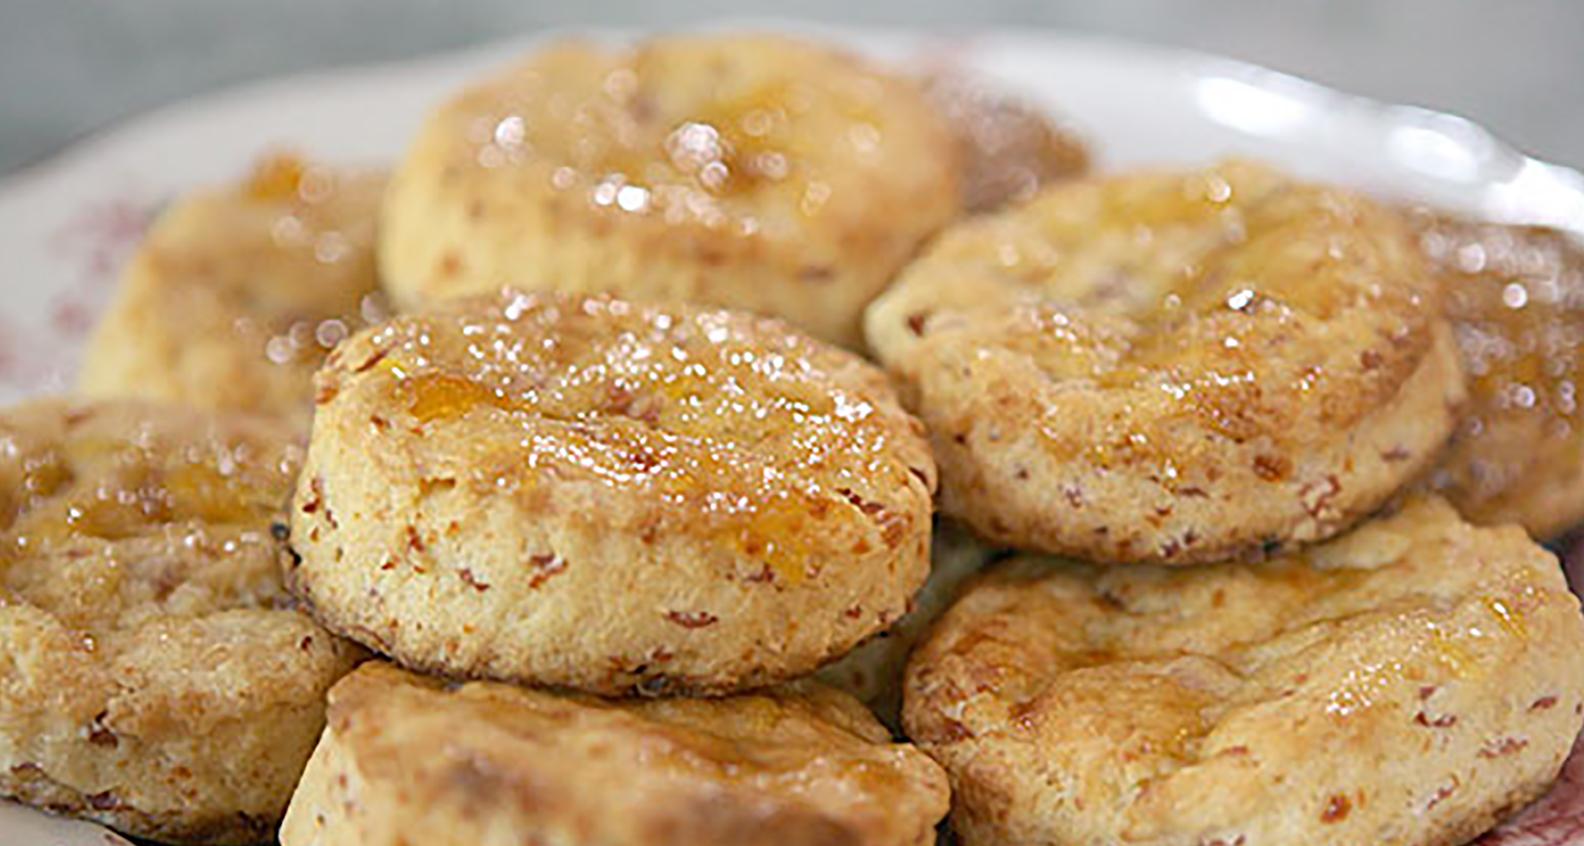 Hampeach biscuit